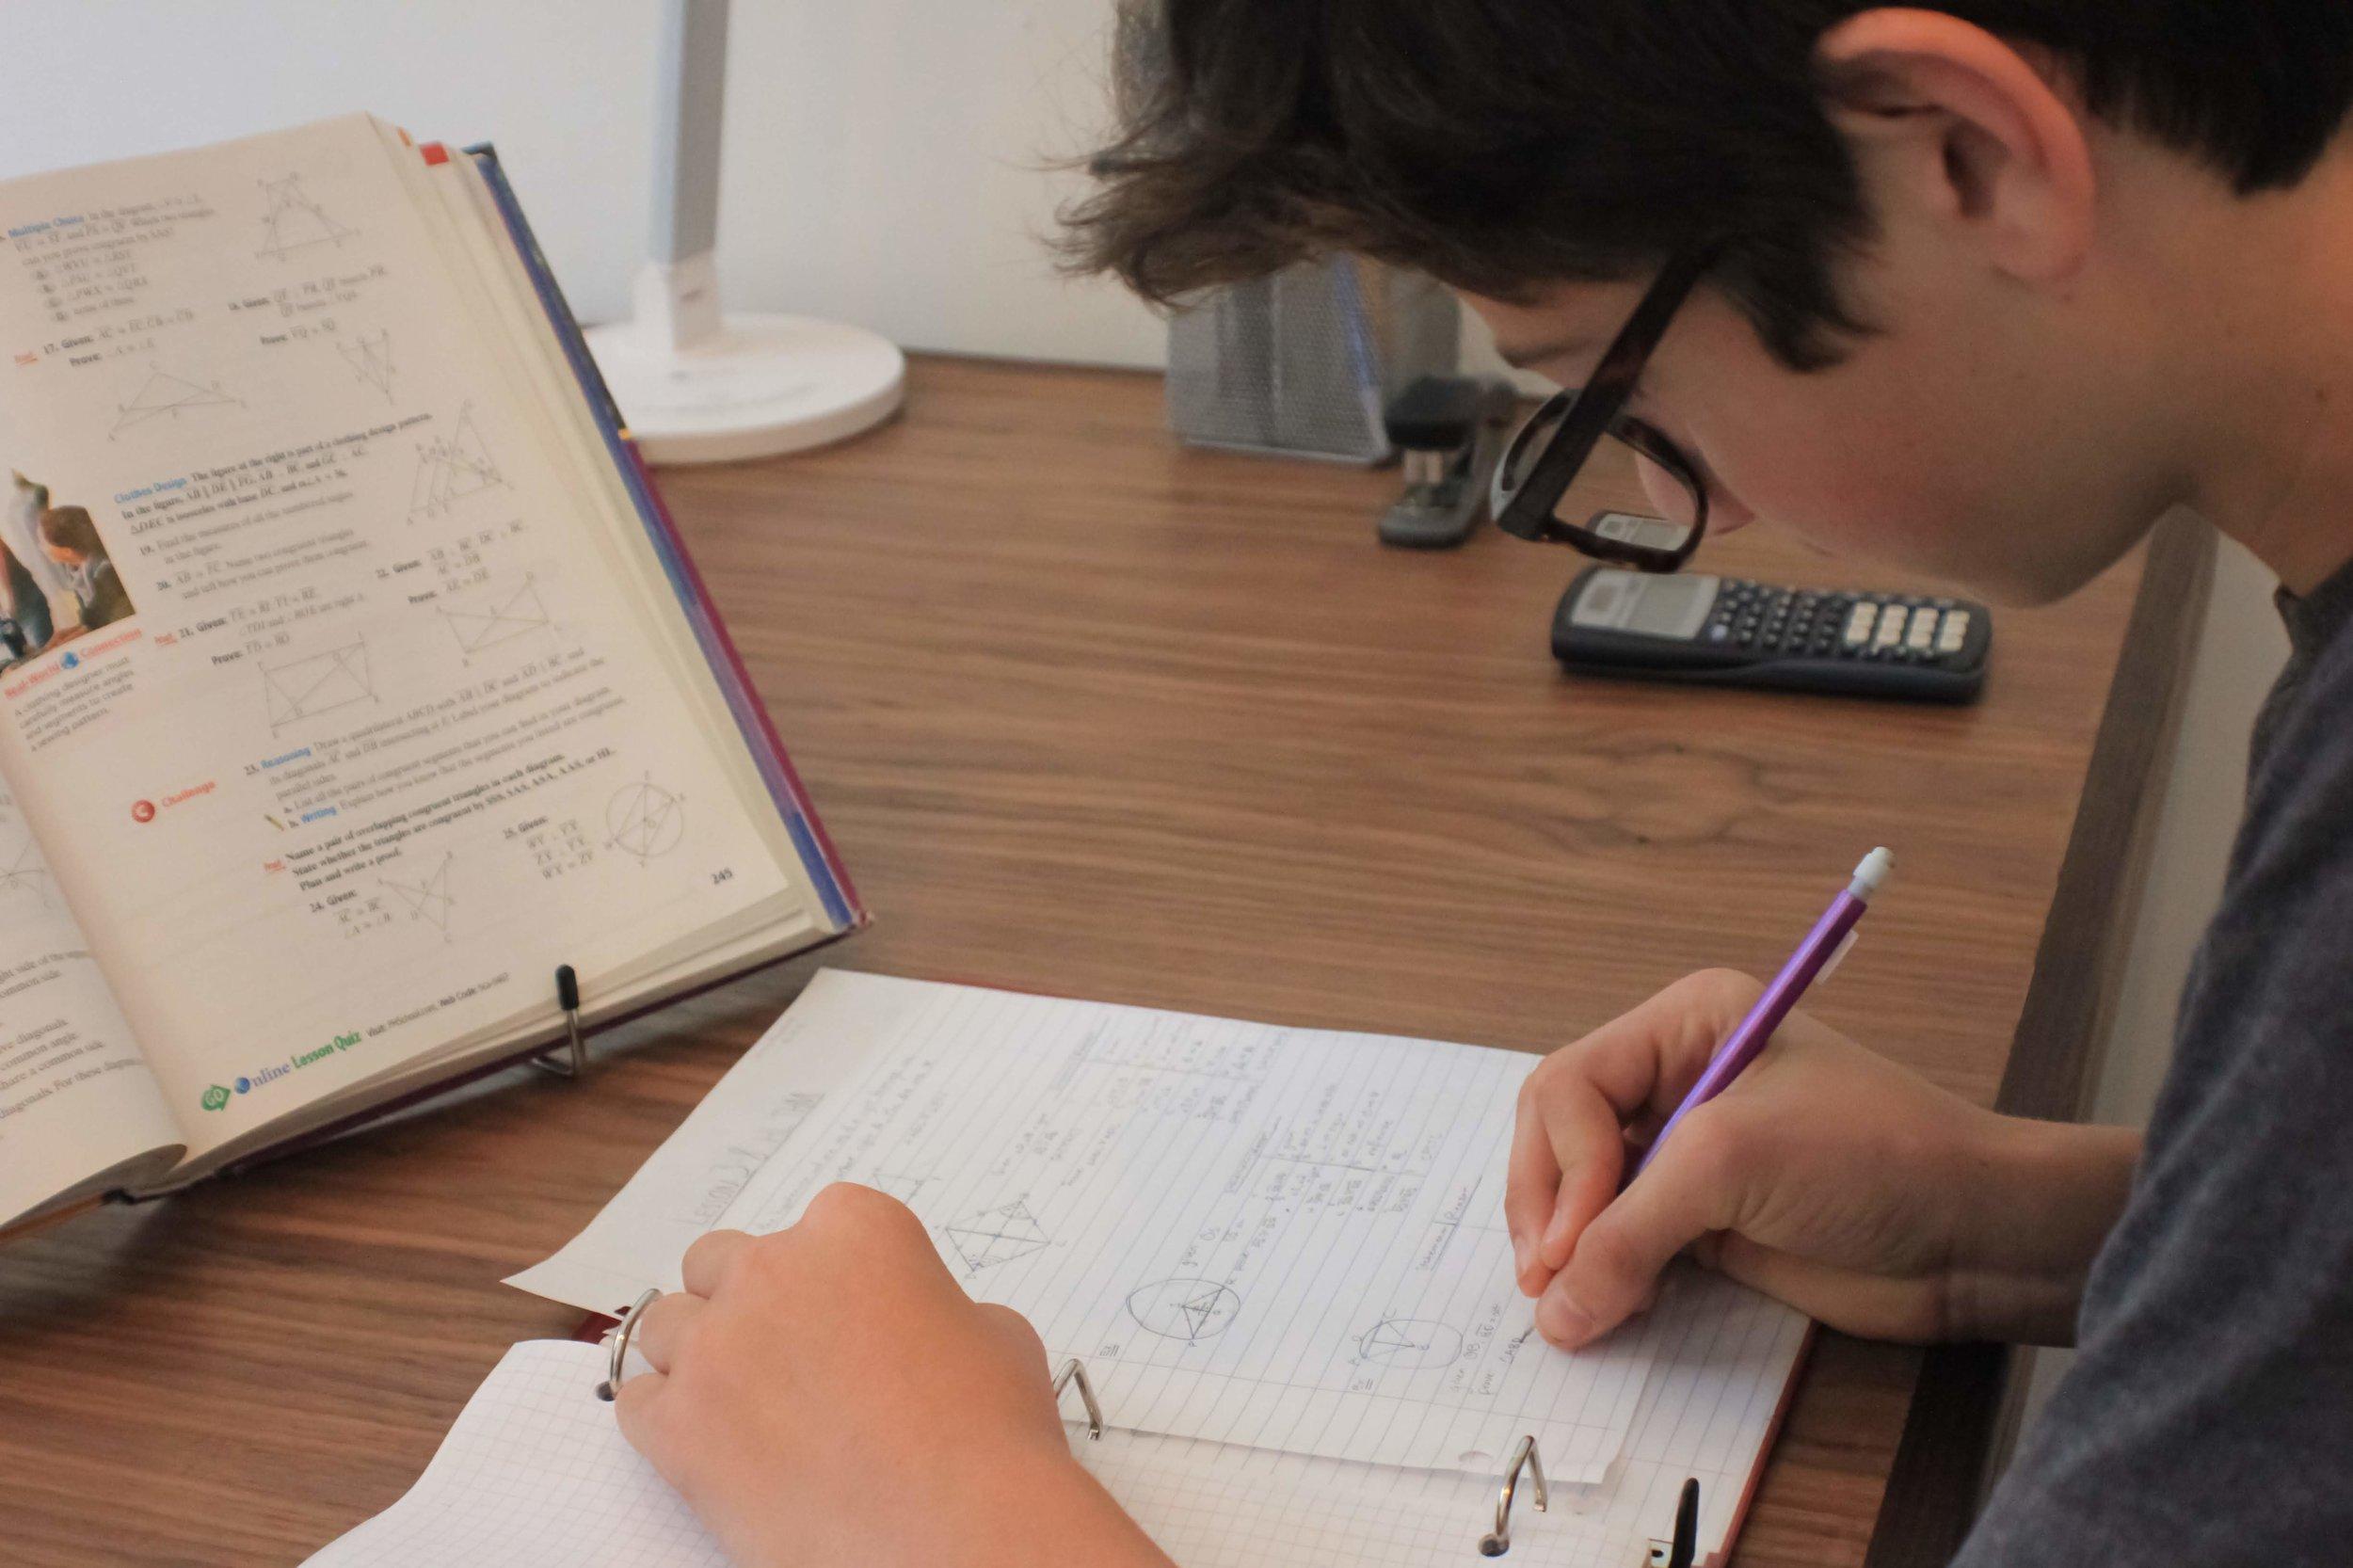 Penny Kostaras Wise Student Helpful Habits